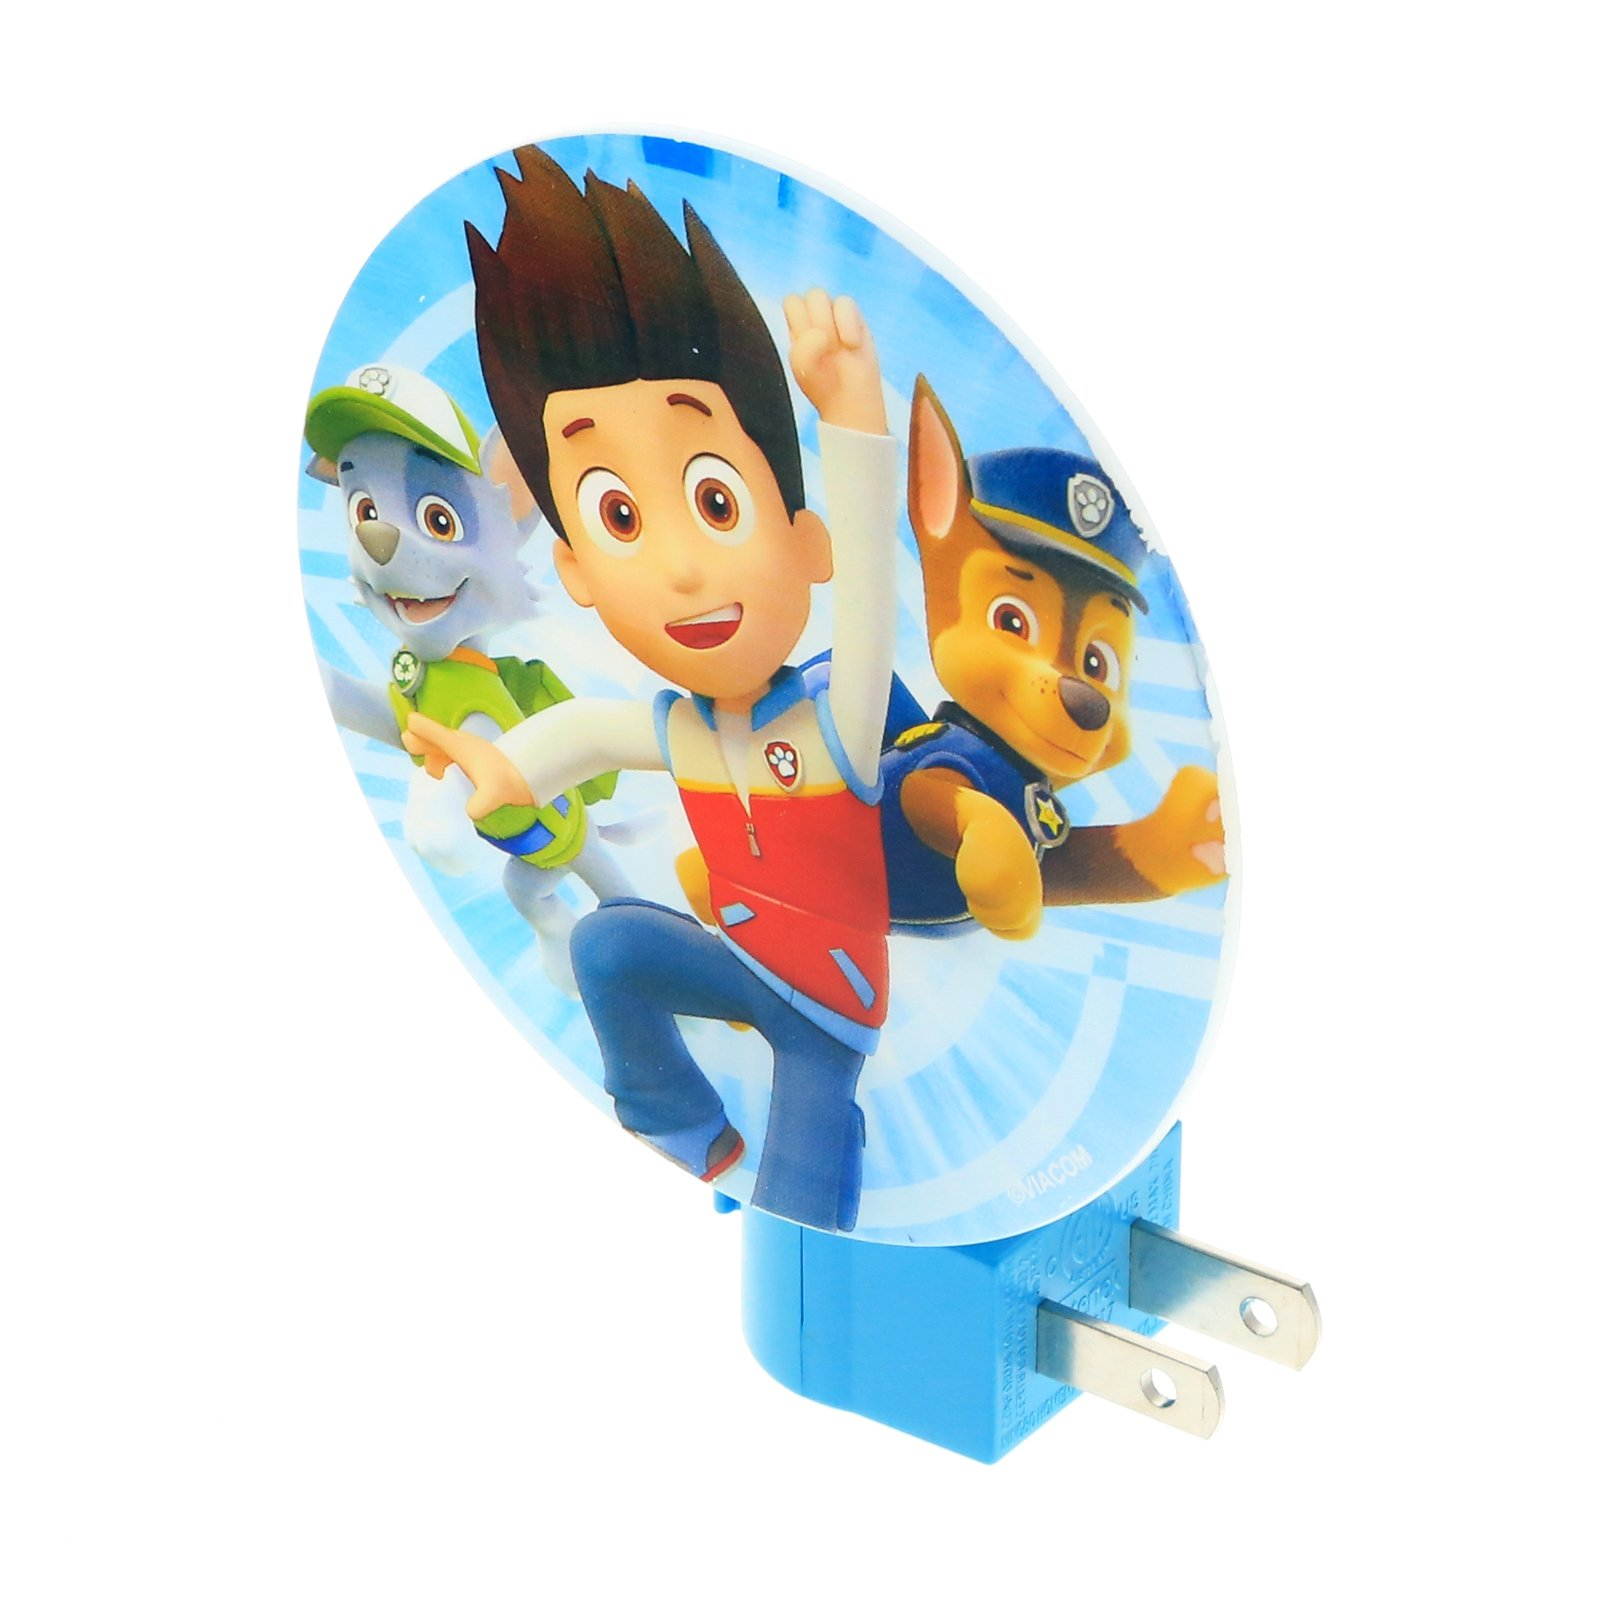 Nickelodeon Paw Patrol Boys Night Light Kids Bedroom Home Decor - Blue